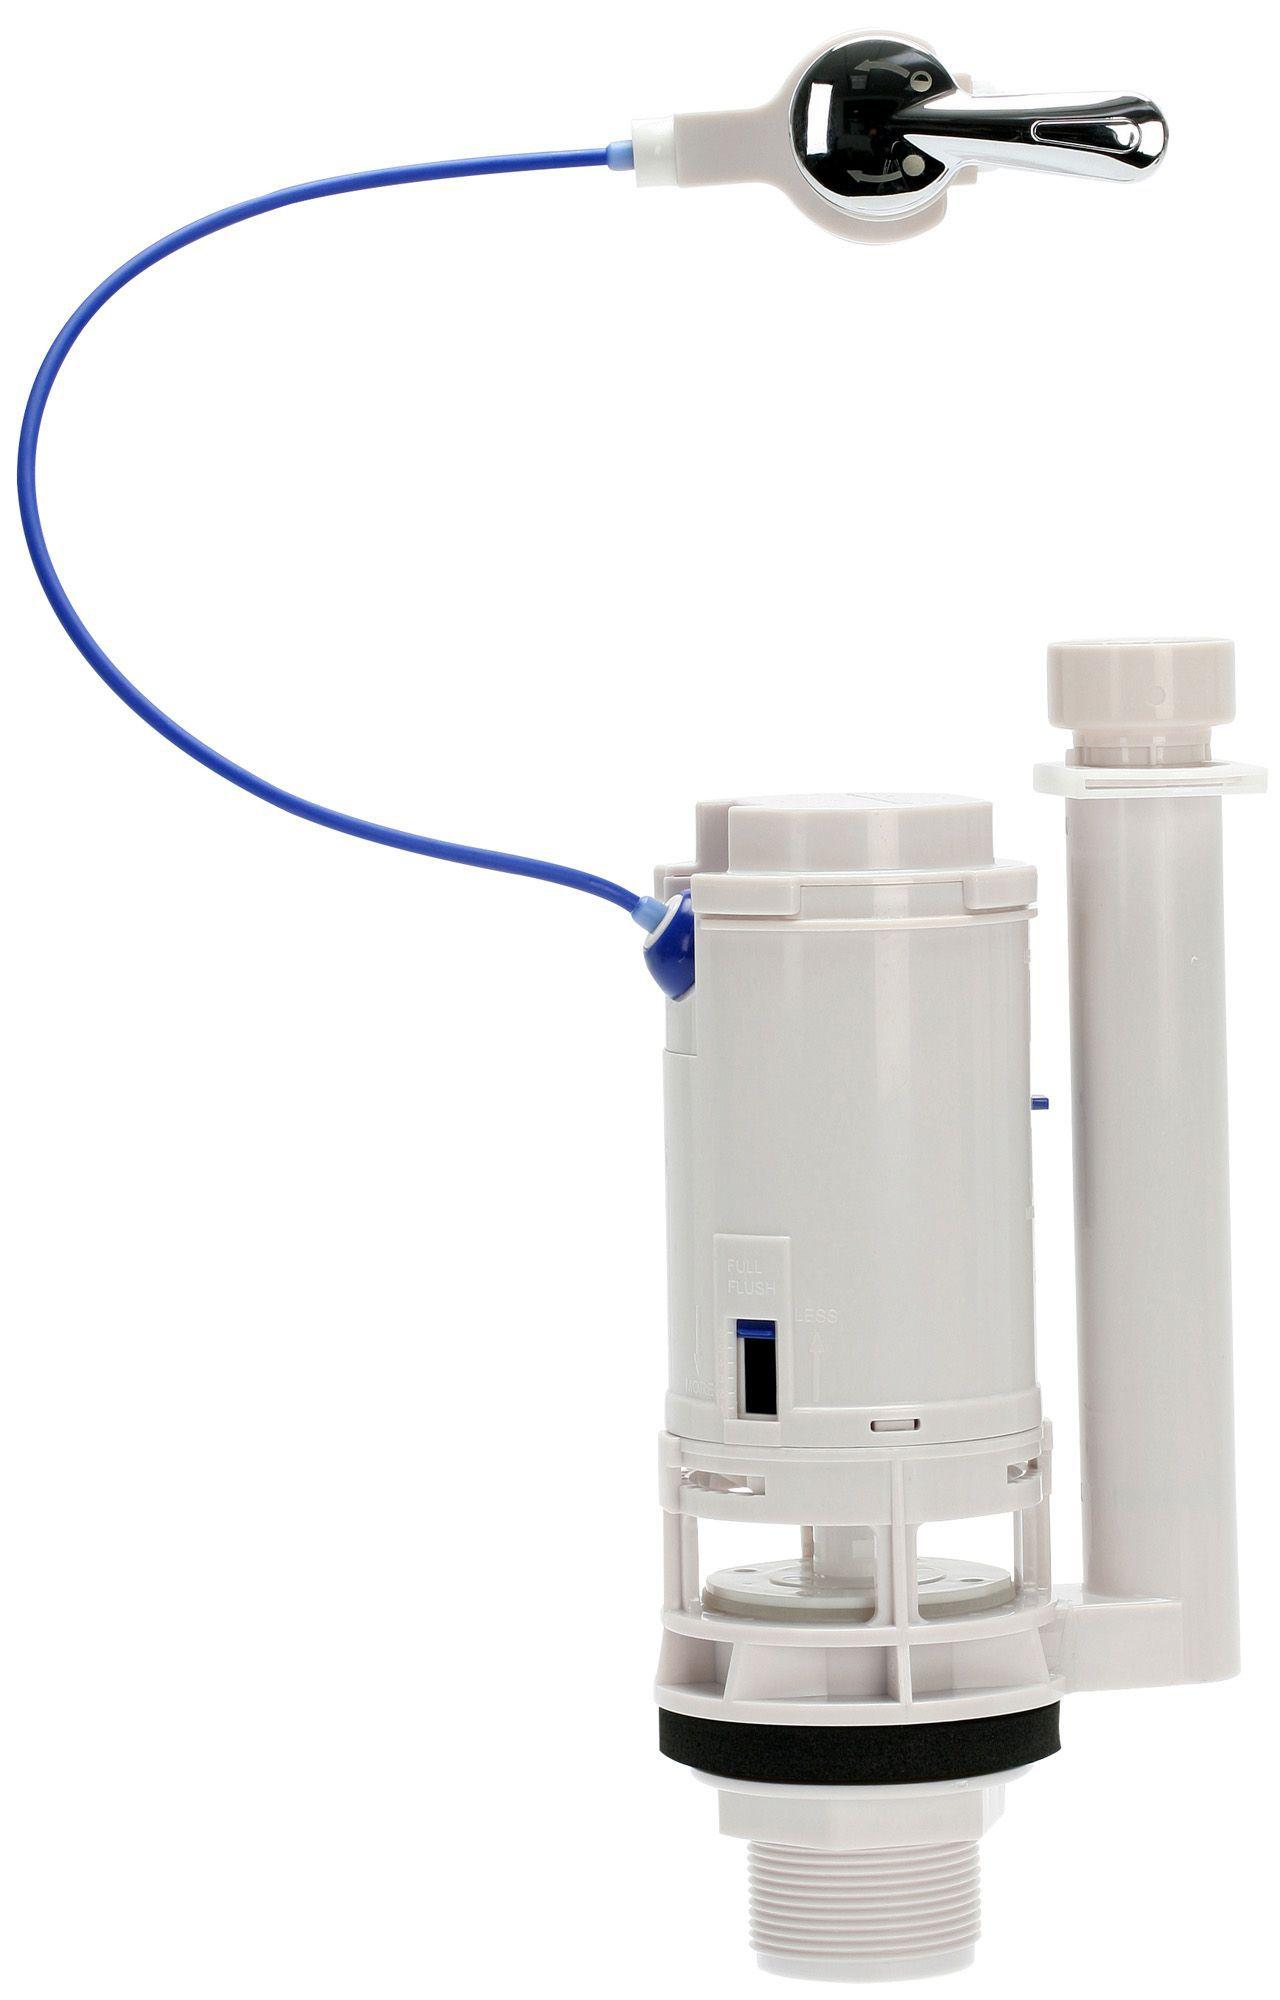 Fluidmaster Dual Flush Valve With Lever Activation